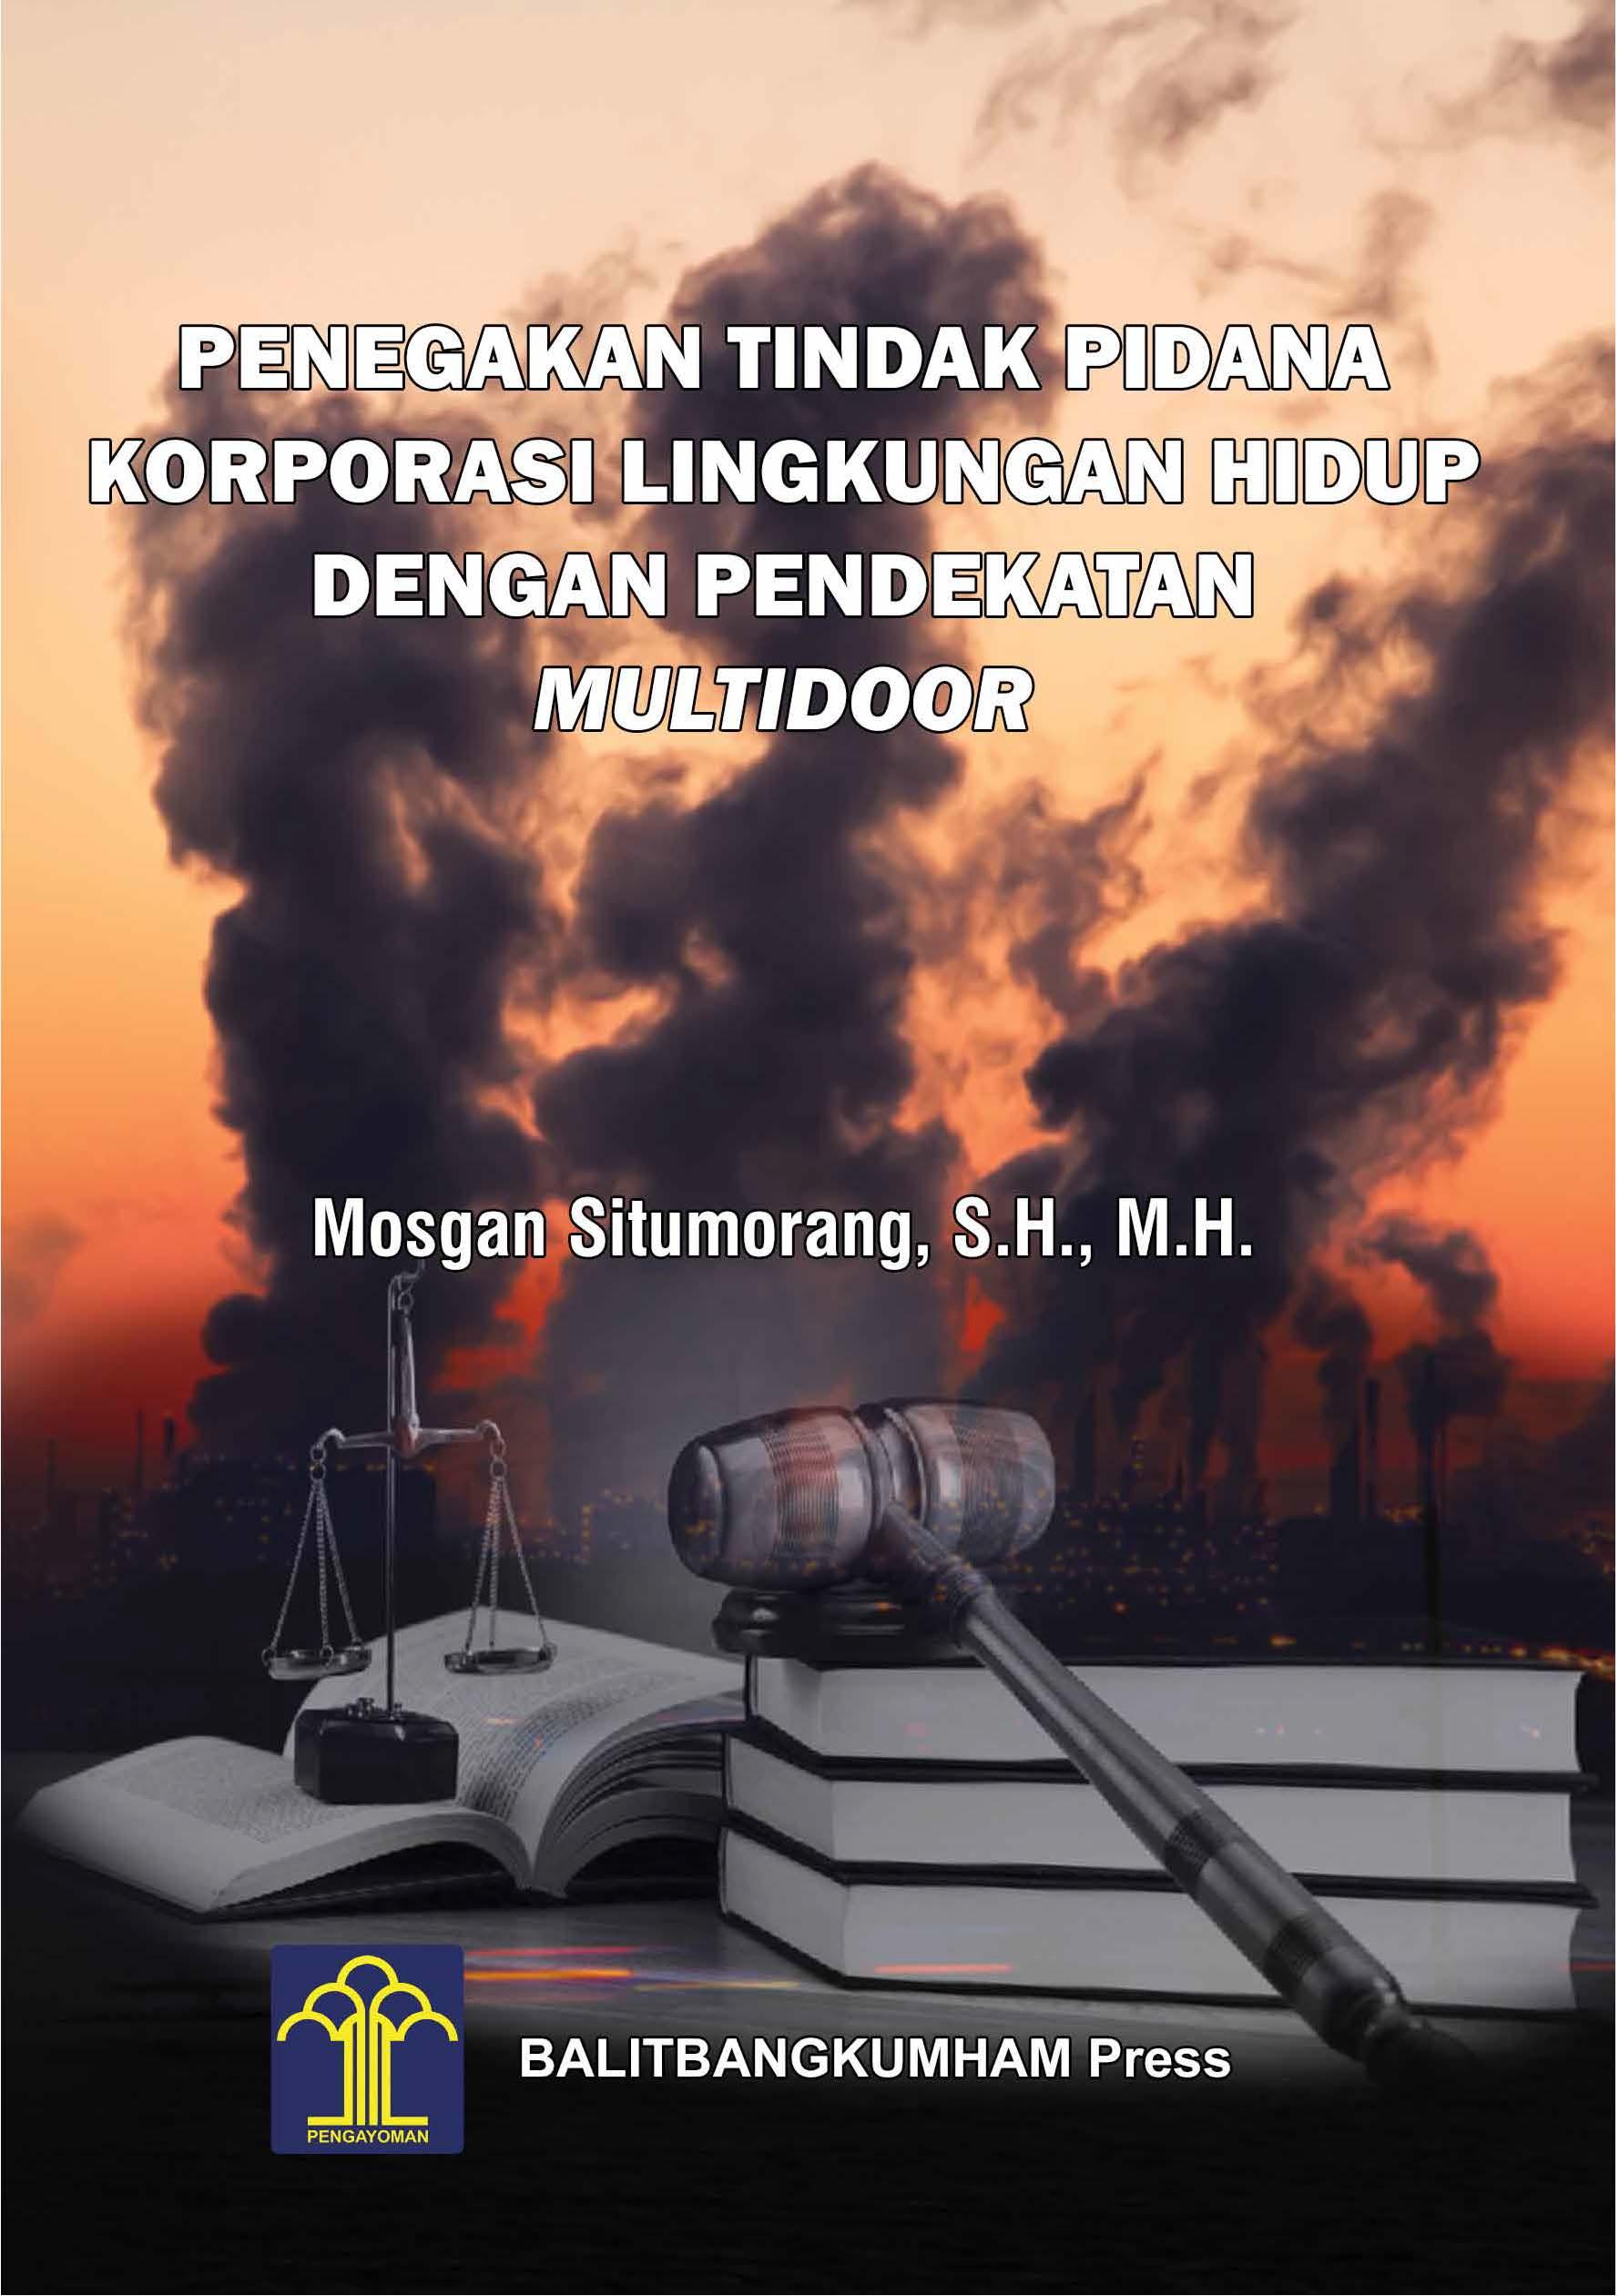 Penegakan Tindak Pidana Korporasi Lingkungan Hidup Dengan Pendekatan Multidoor